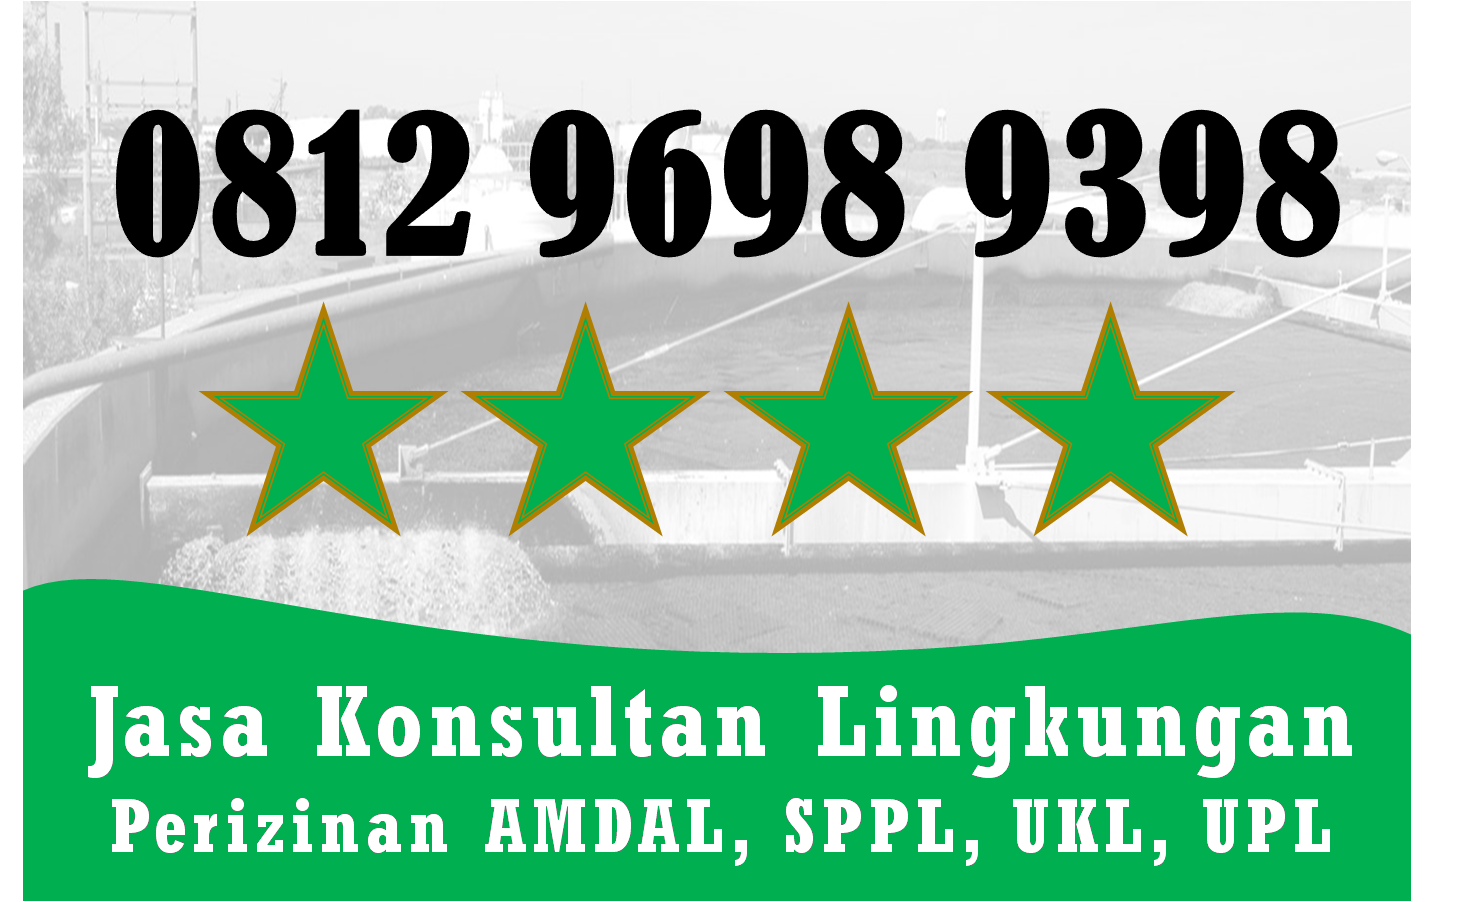 Order Sekarang Telp Wa 0812 9698 9398 Laporan Semester Ukl Upl Rumah Sakit Kab Temanggung Jawa Kota Bukittinggi Kendaraan Kota Kota Denpasar